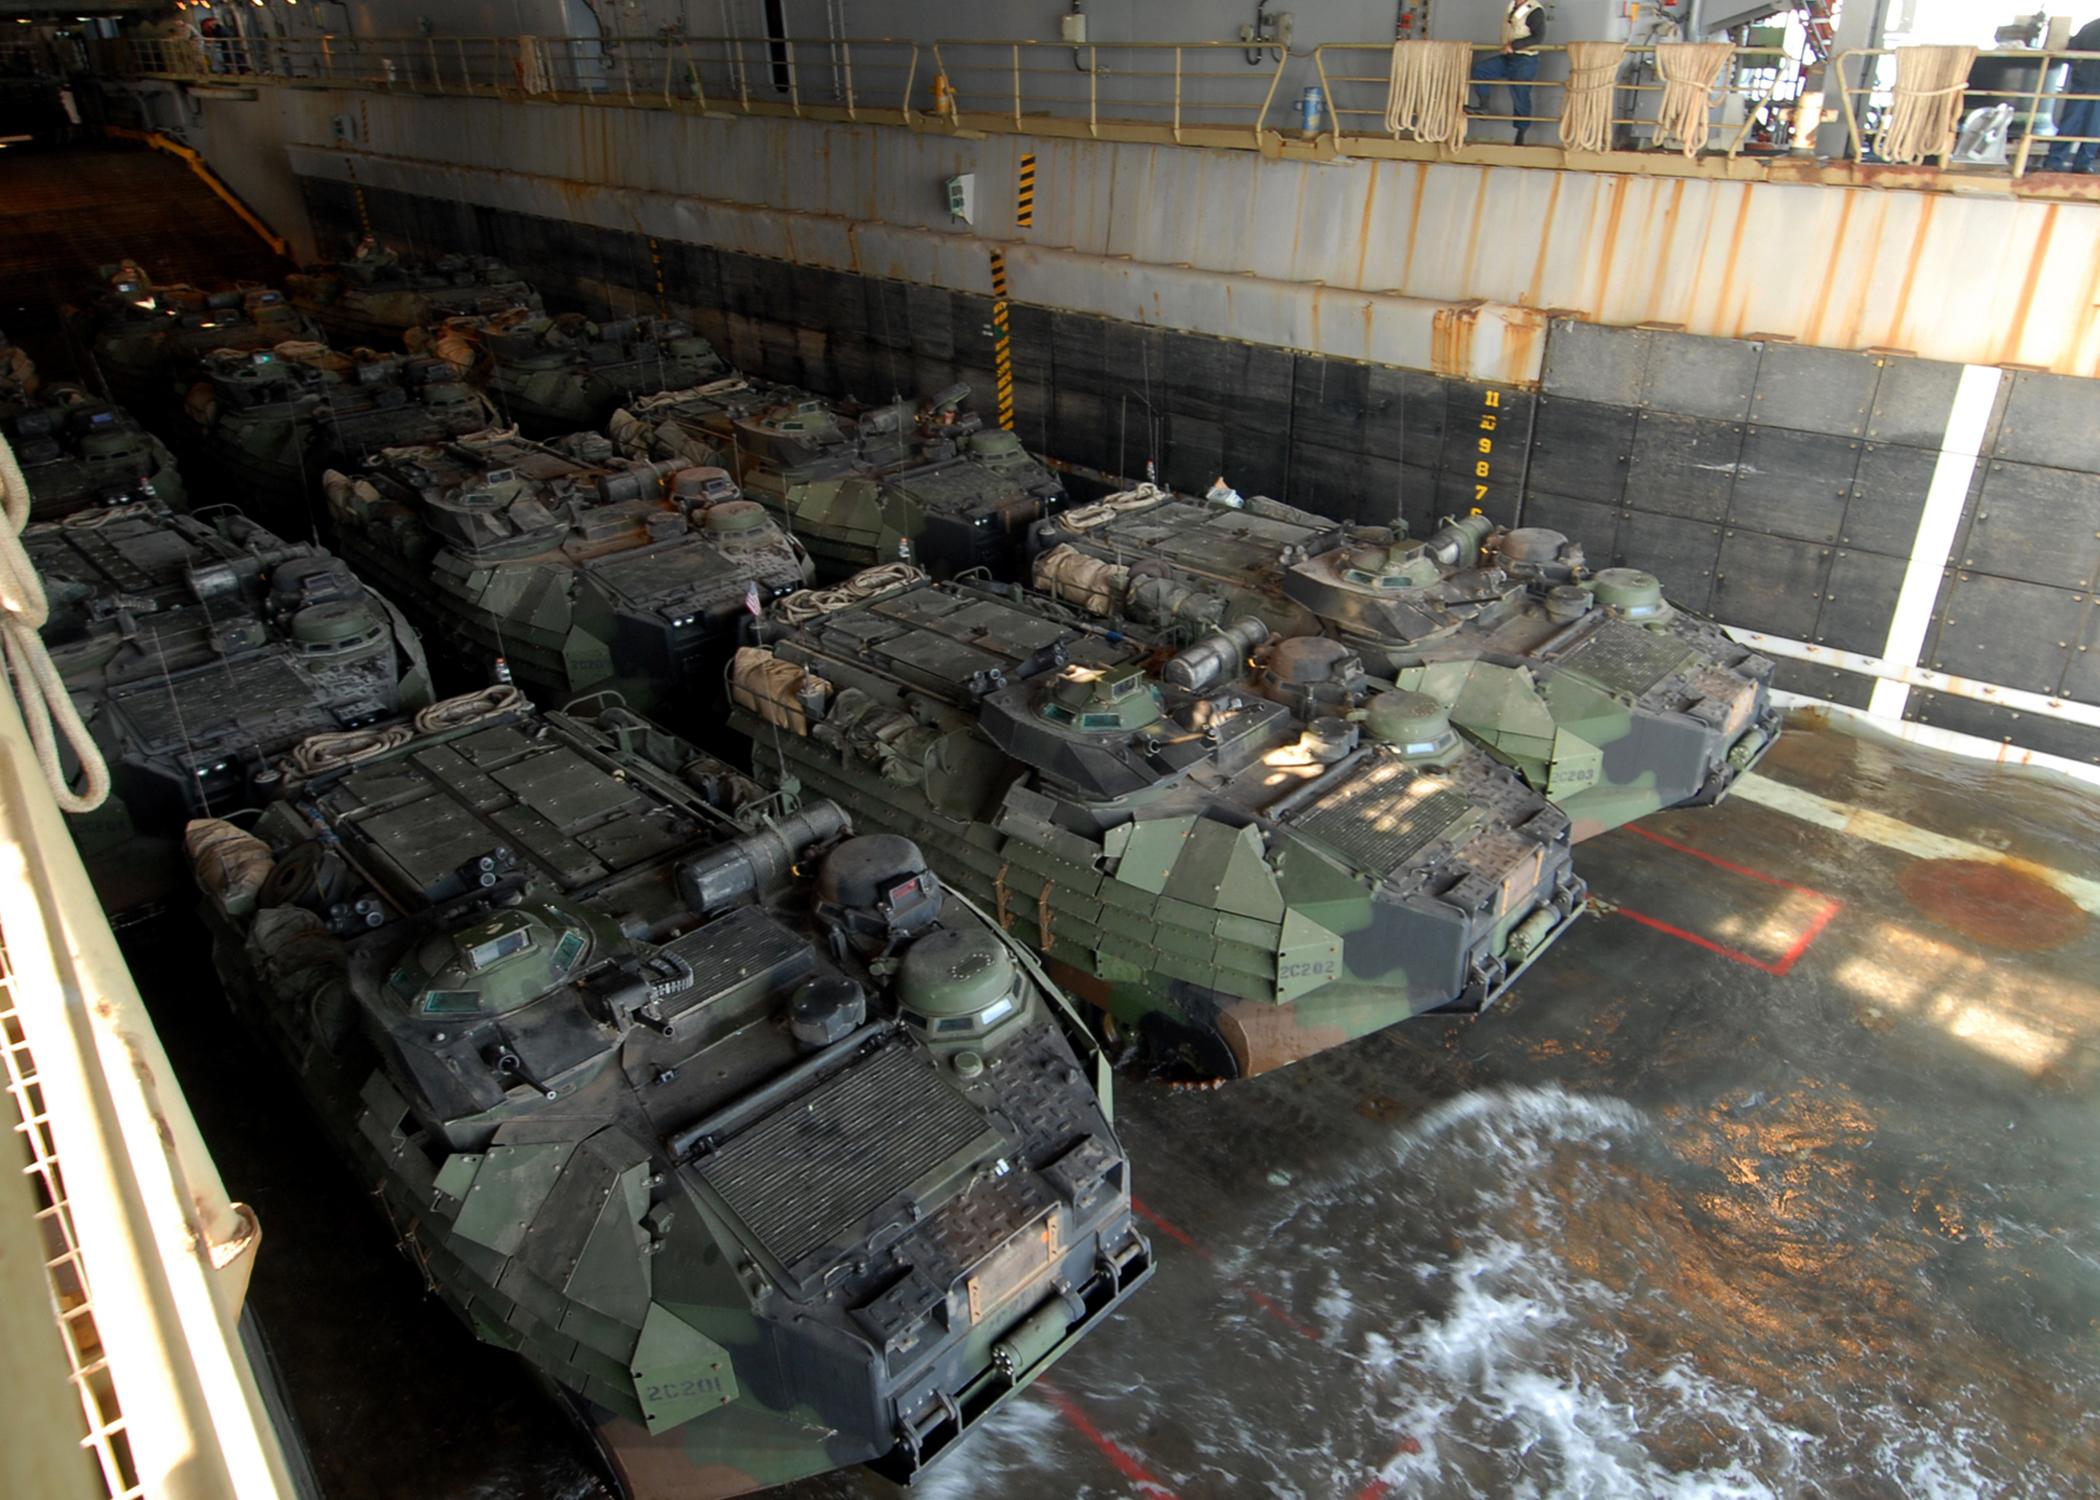 US_Navy_081229-N-9134V-036_Amphibious_assault_vehicles_prepare_to_disembark_from_the_well_deck_of_the_amphibious_dock_landing_ship_USS_Carter_Hall_%28LSD_50%29.jpg